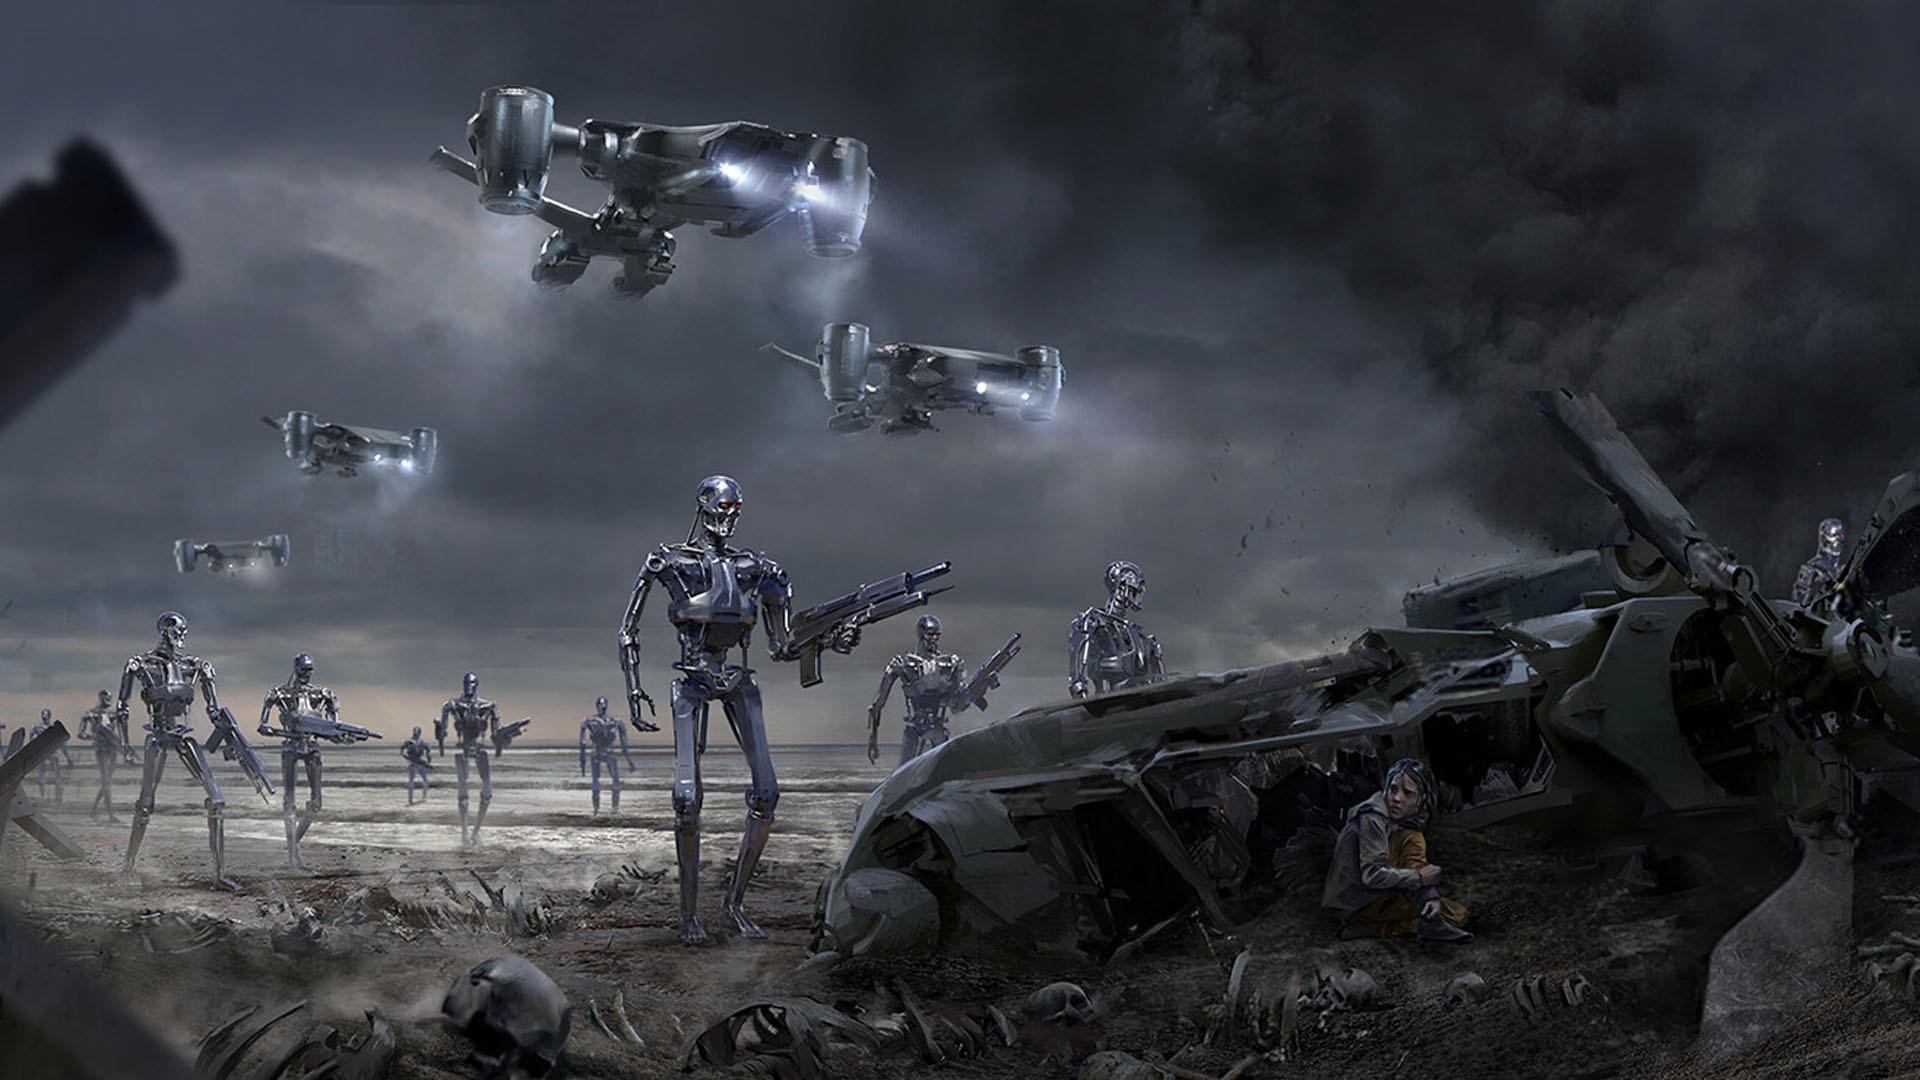 Wallpaper : Terminator, apocalyptic